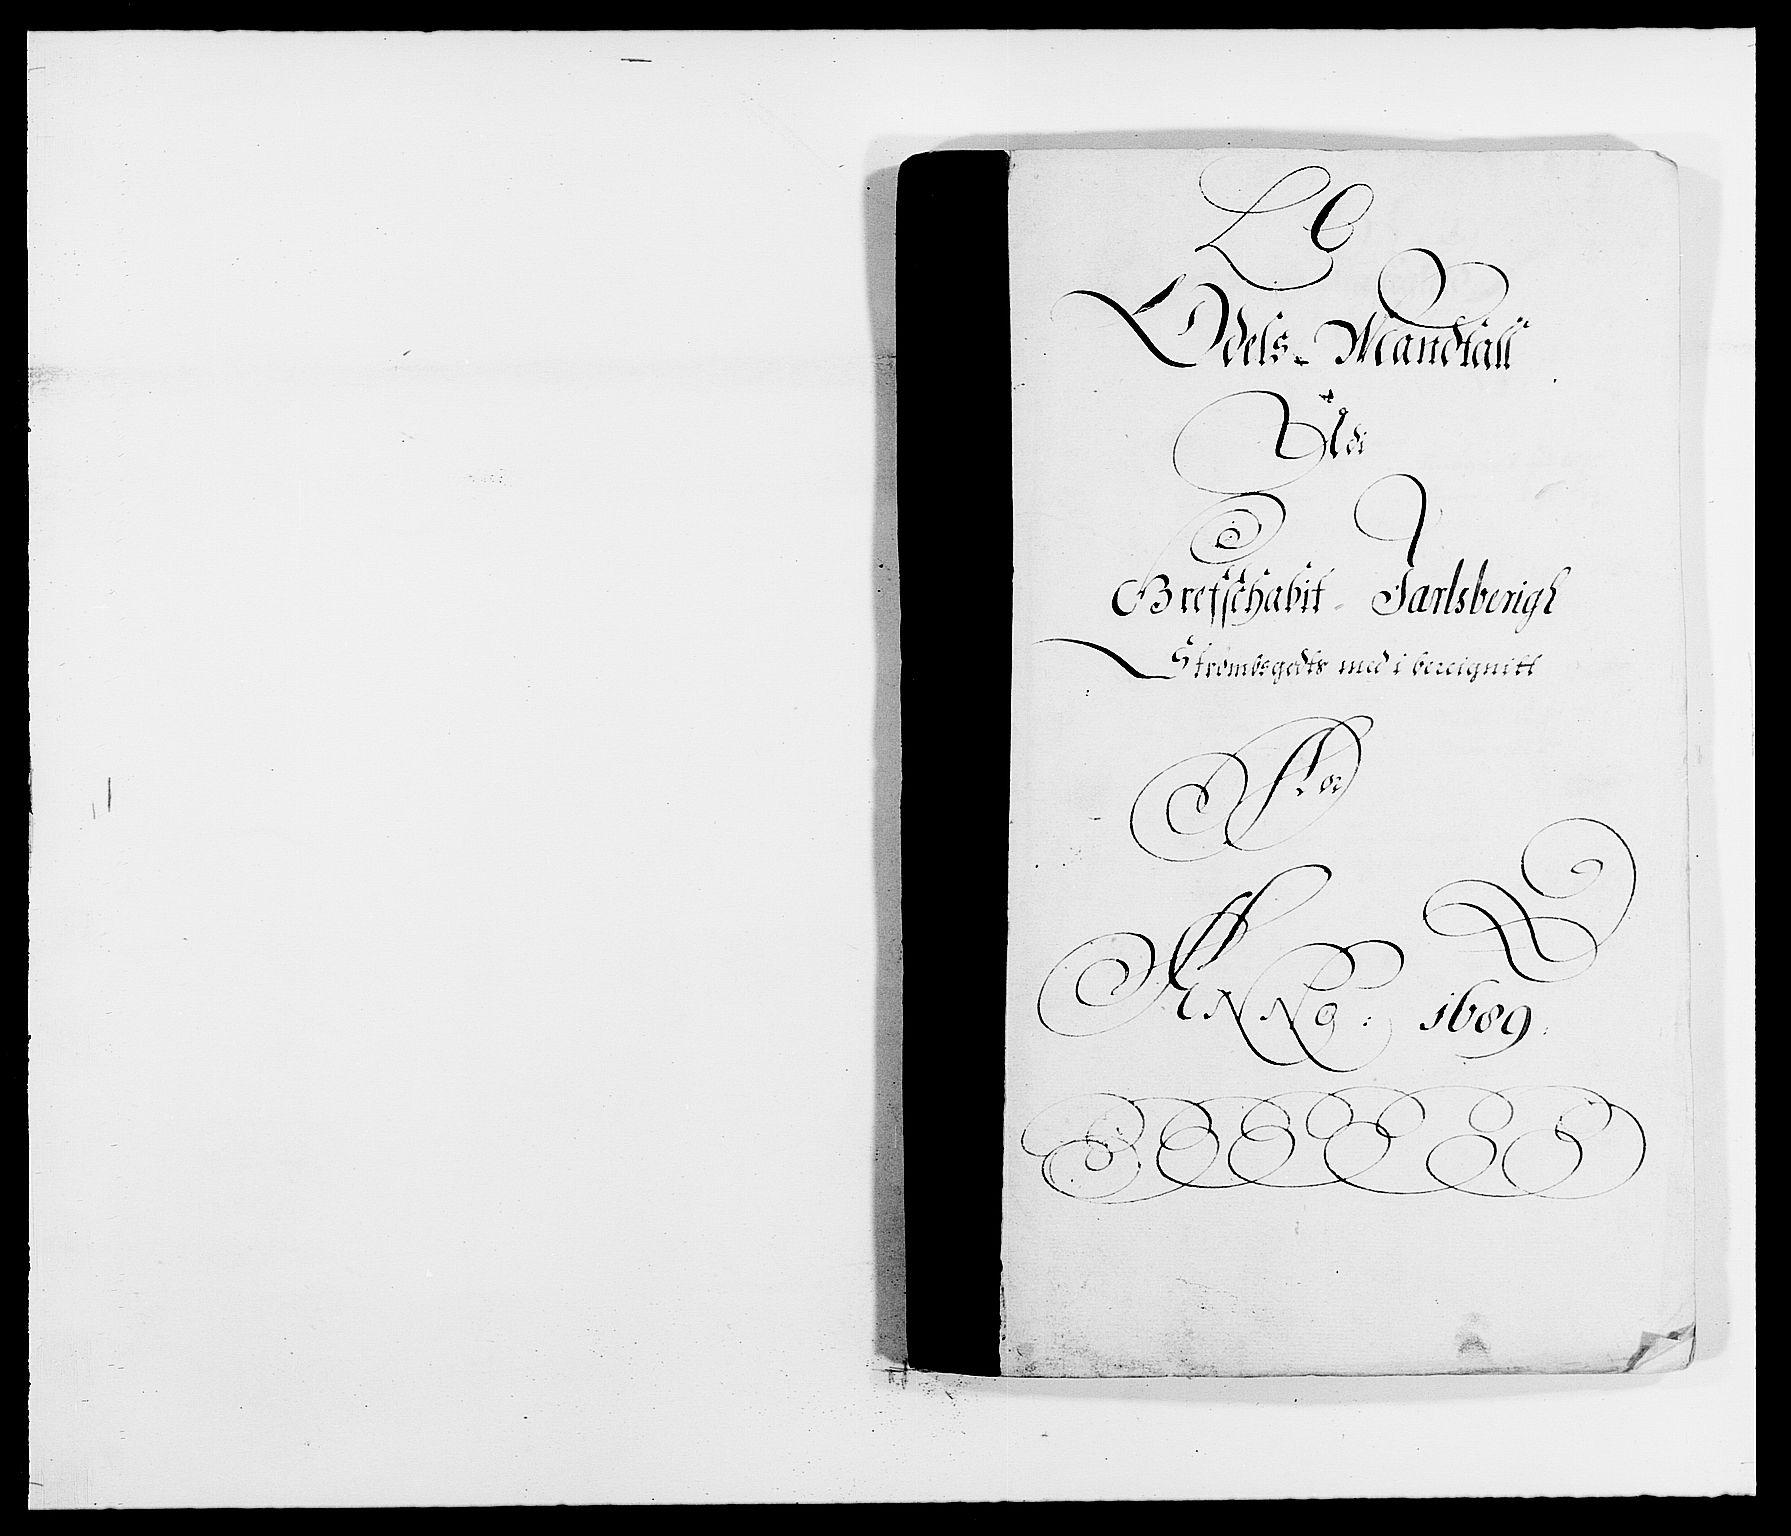 RA, Rentekammeret inntil 1814, Reviderte regnskaper, Fogderegnskap, R32/L1860: Fogderegnskap Jarlsberg grevskap, 1686-1690, s. 148